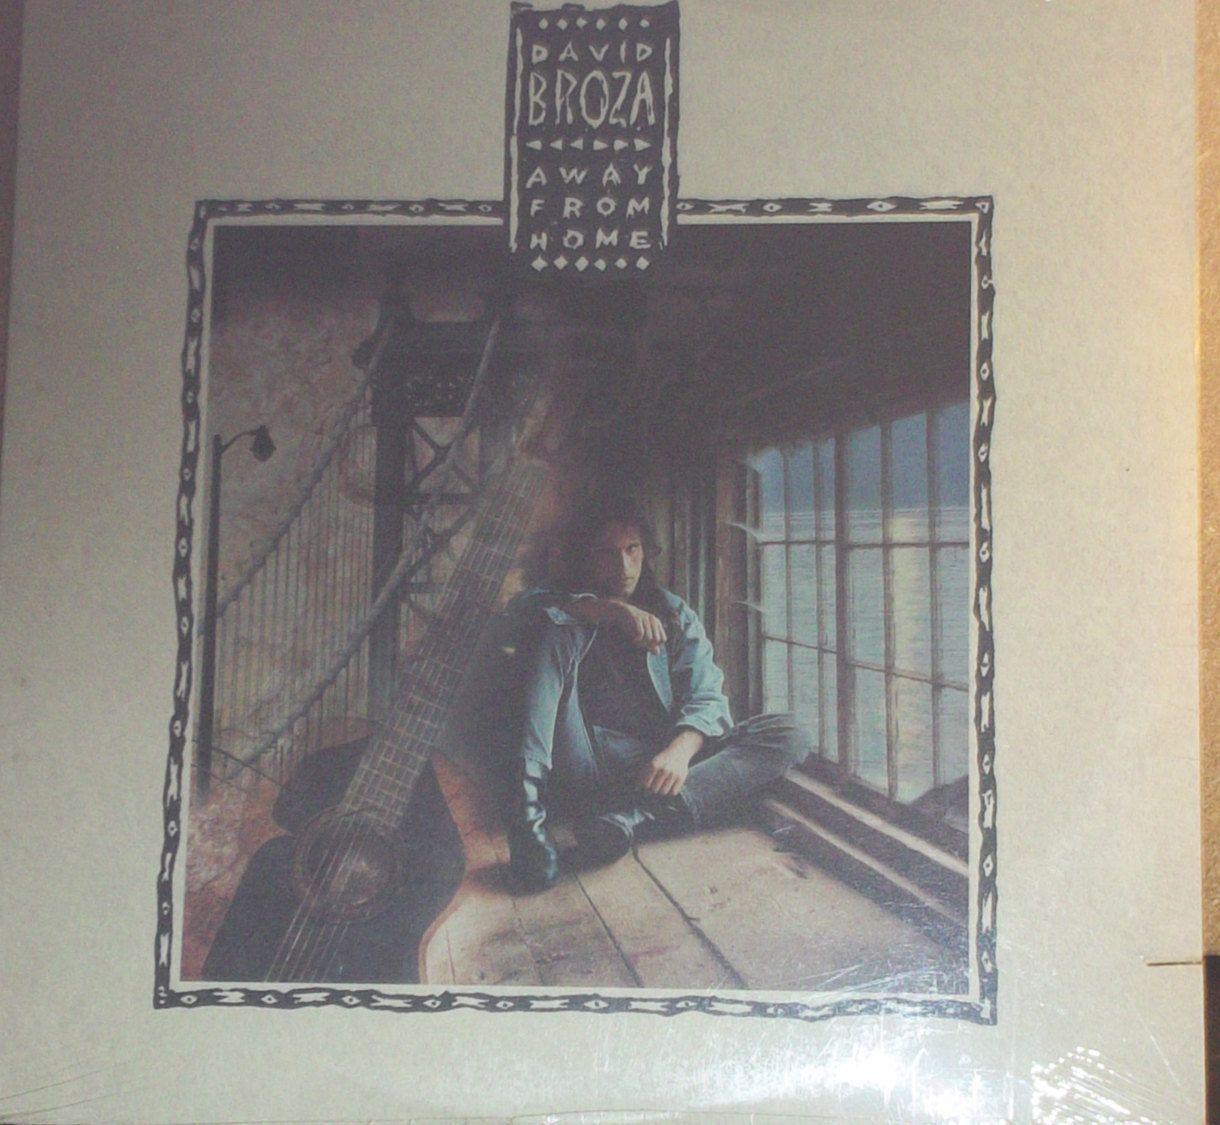 David Broza Away From Home Sealed Vinyl Rock Record Album by RASVINYL on Etsy